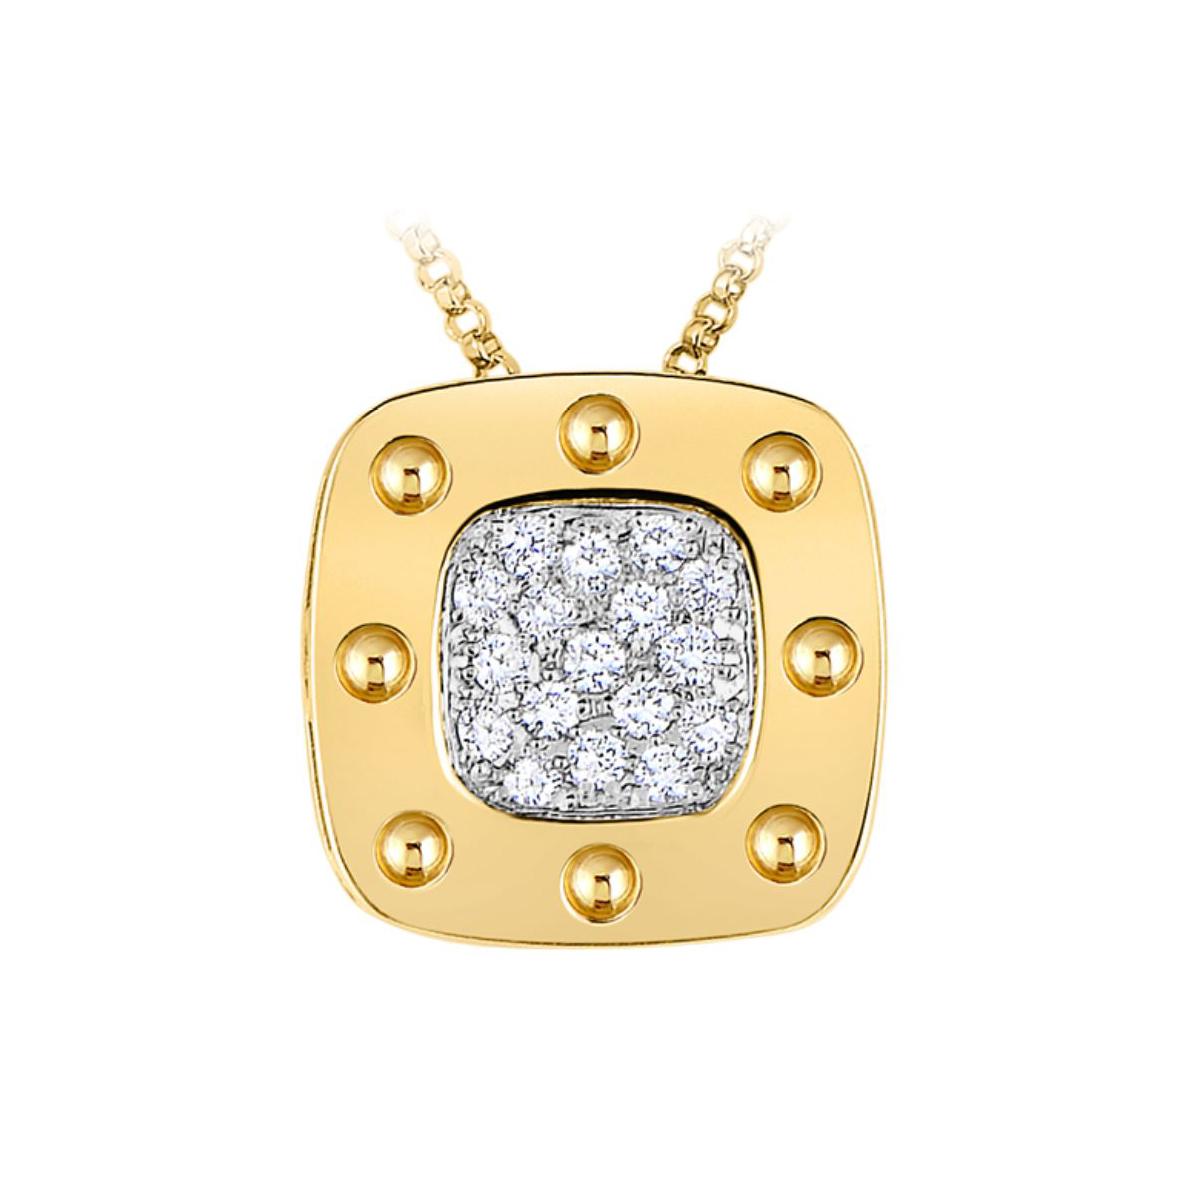 Roberto Coin 18 Karat Yellow Gold Pois Moi Large Diamond Pendant Necklace